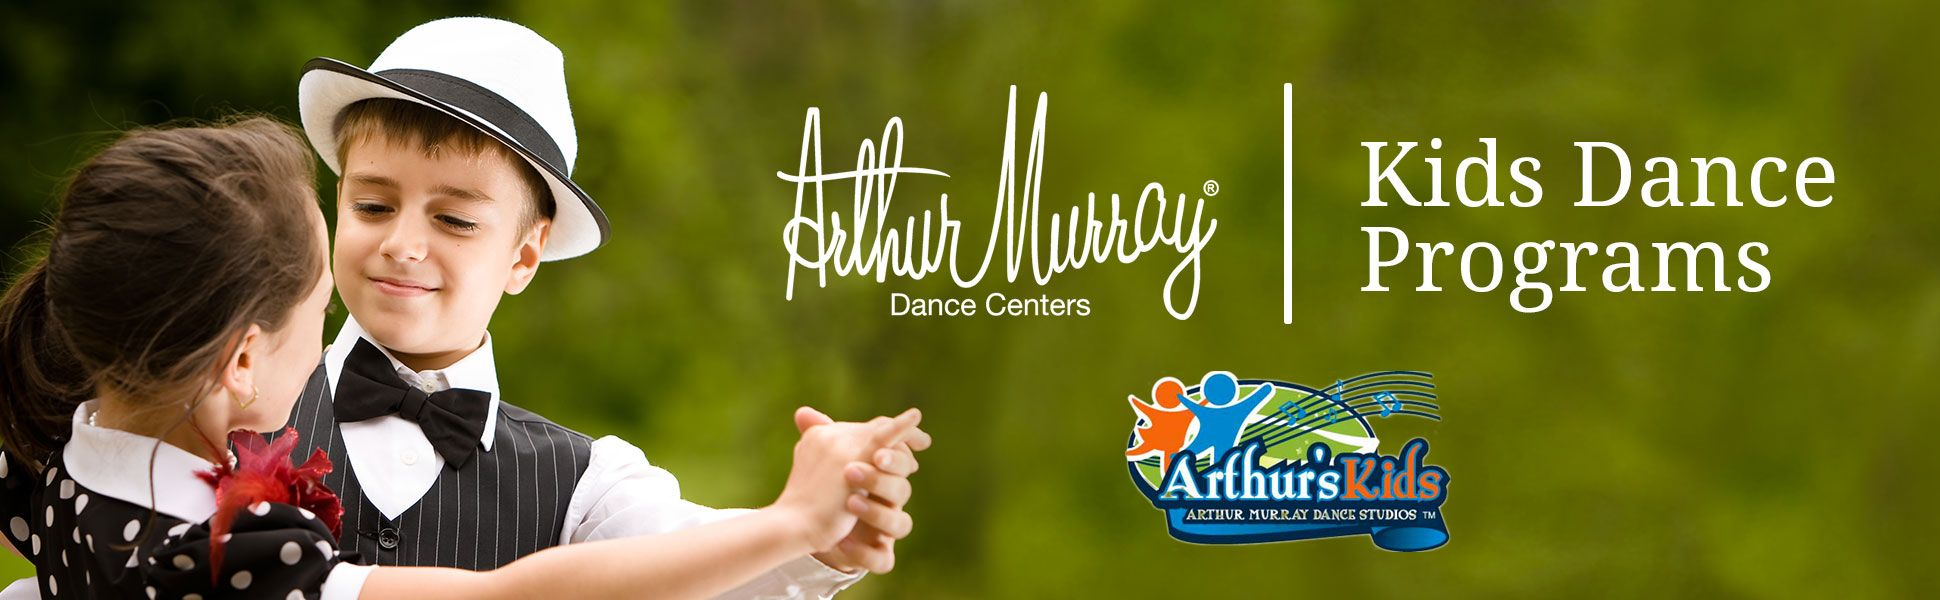 Arthur Murray Kids Dance Lessons